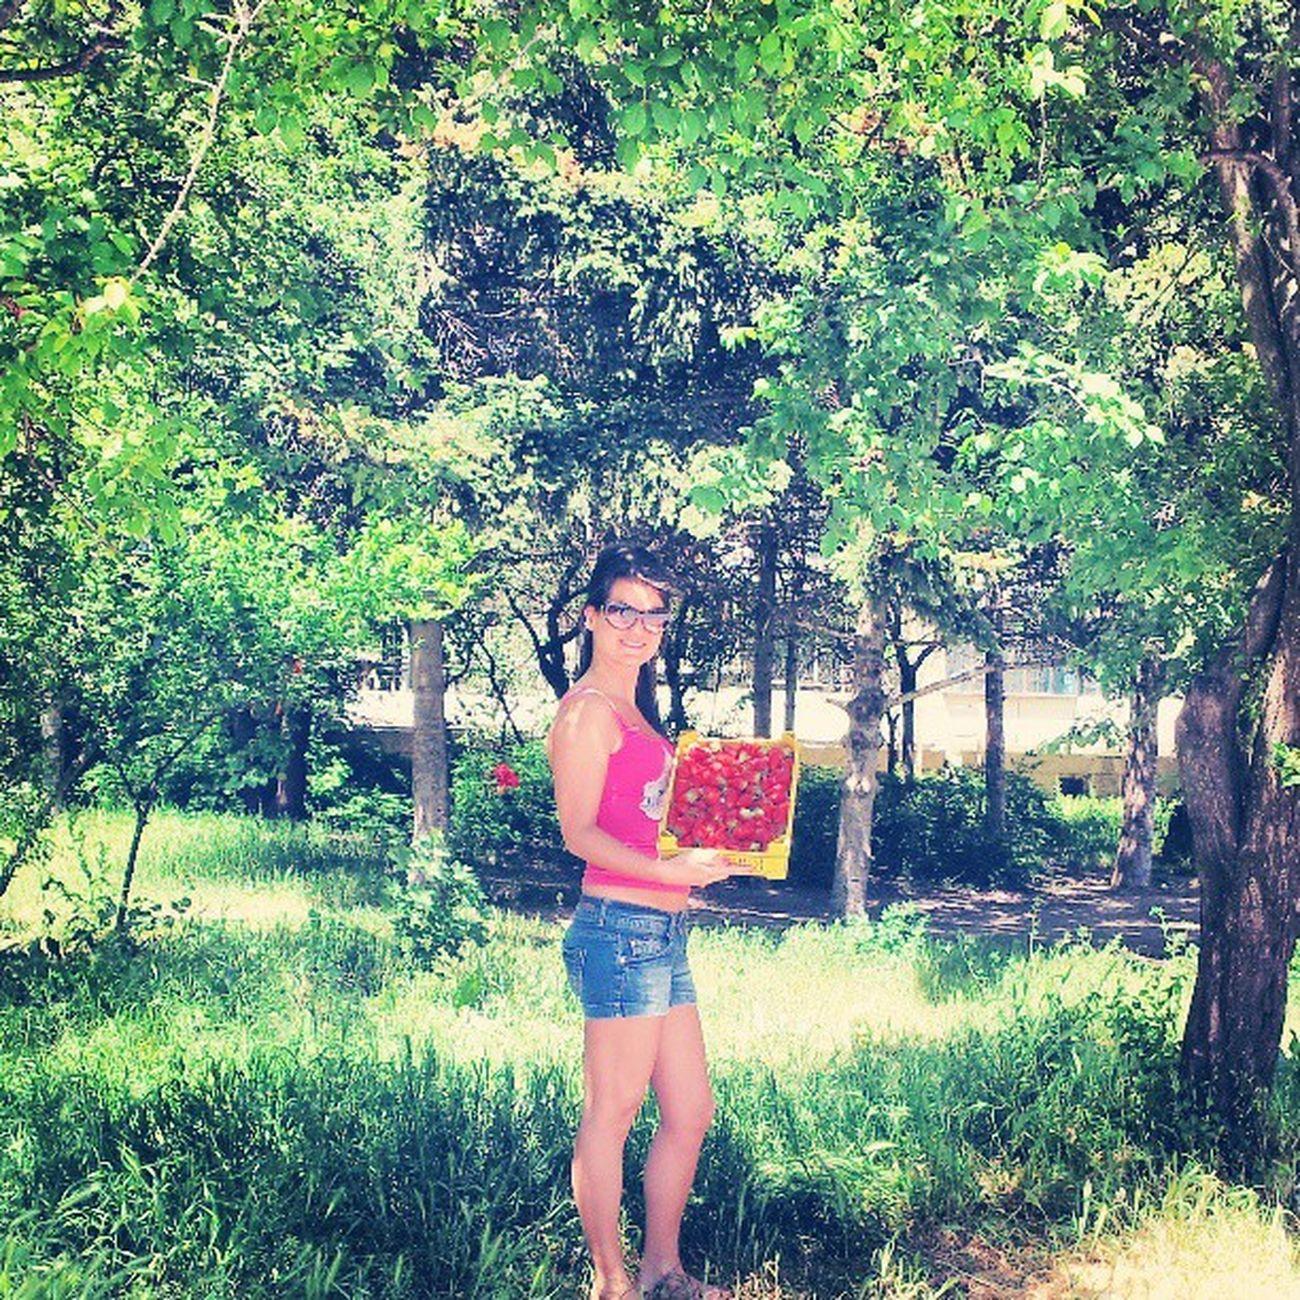 Straberry Tree Garden Instegramer instagramania instegramvarna android anıyaşa fabshots fashion followme shoutout turkishfollowers picofthethay photojournalism jj me